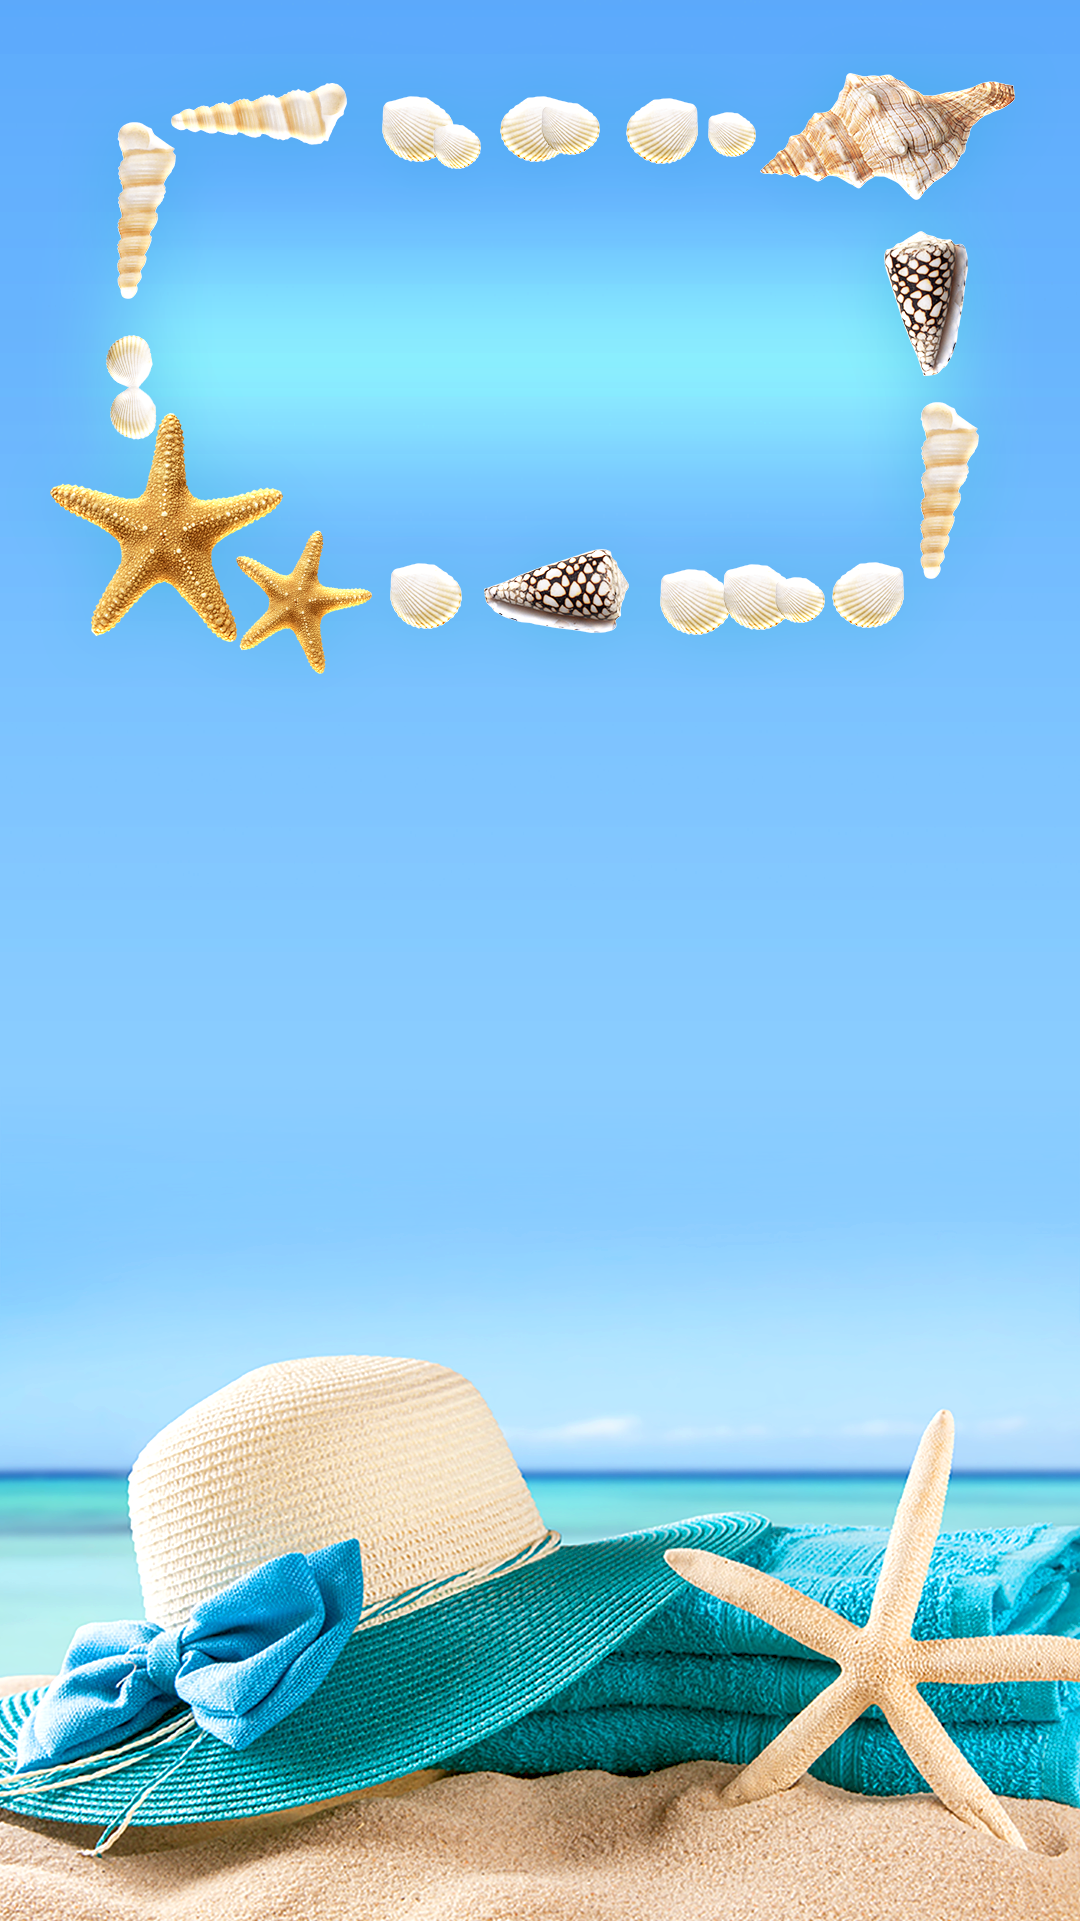 Tap And Get The Free App Lockscreens Art Creative Sky Water Sun Beach Chill Hat Star Blue Hd Iphone 6 Plus Lock Screen Achtergronden Op Het Strand Wallpaper